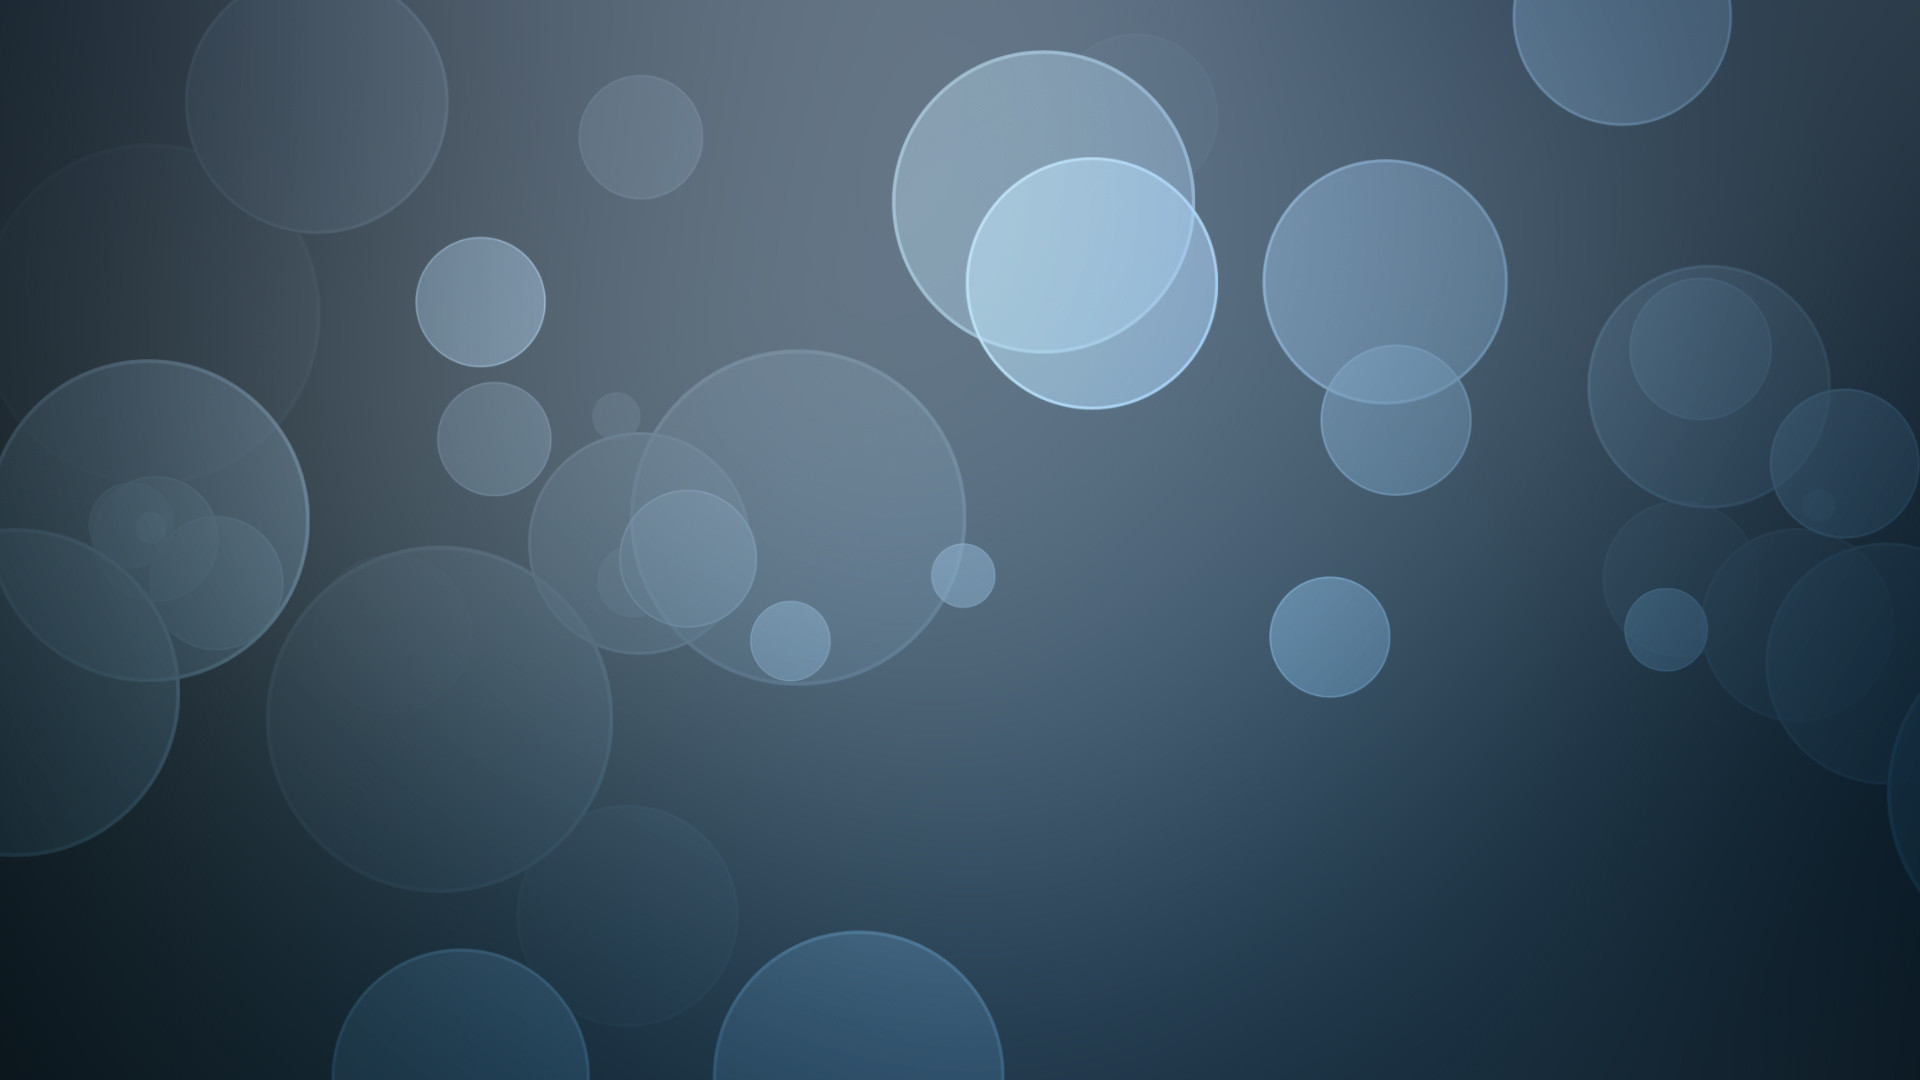 Grey-Abstract-wallpapers-hd.jpg